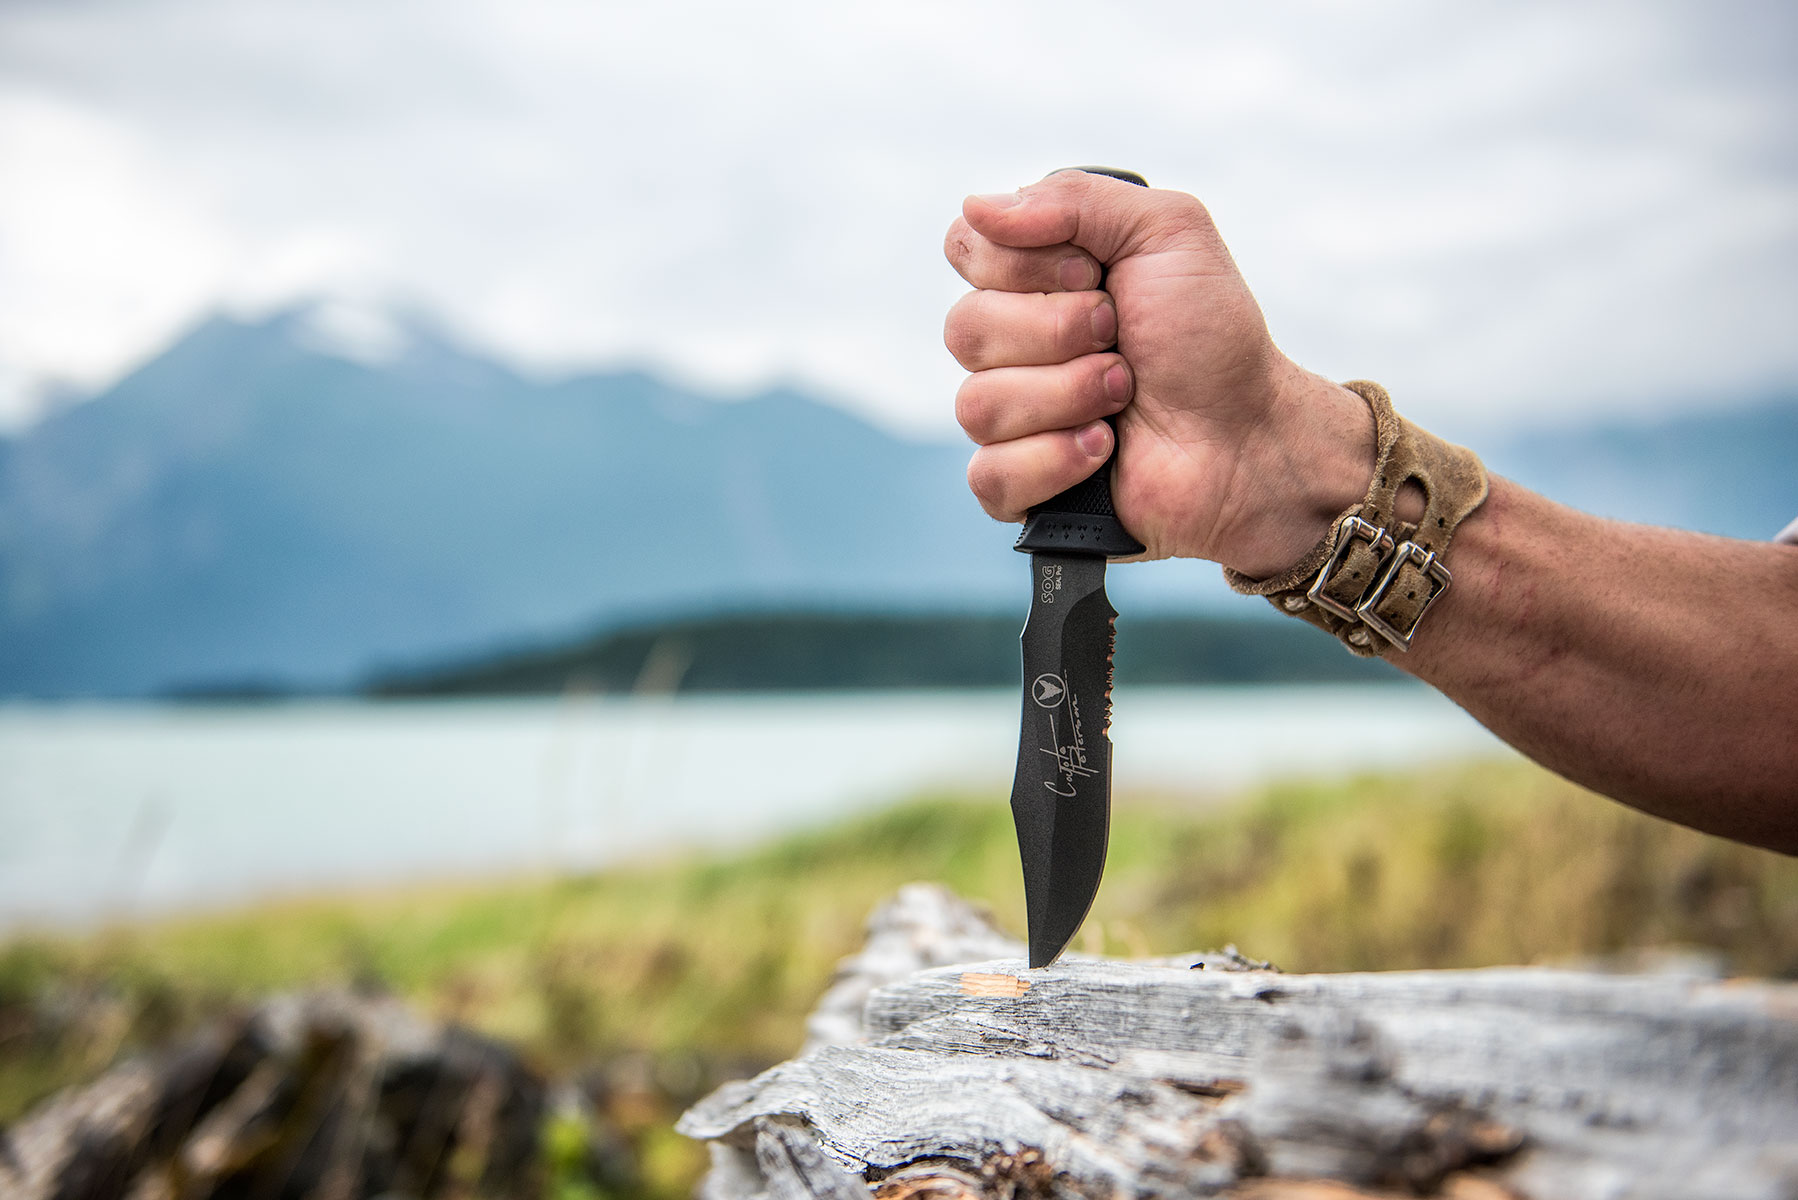 austin-trigg-brave-wilderness-alaska-BW-Coyote-Sticks-Sog-Knife-DSC_8379-web.jpg